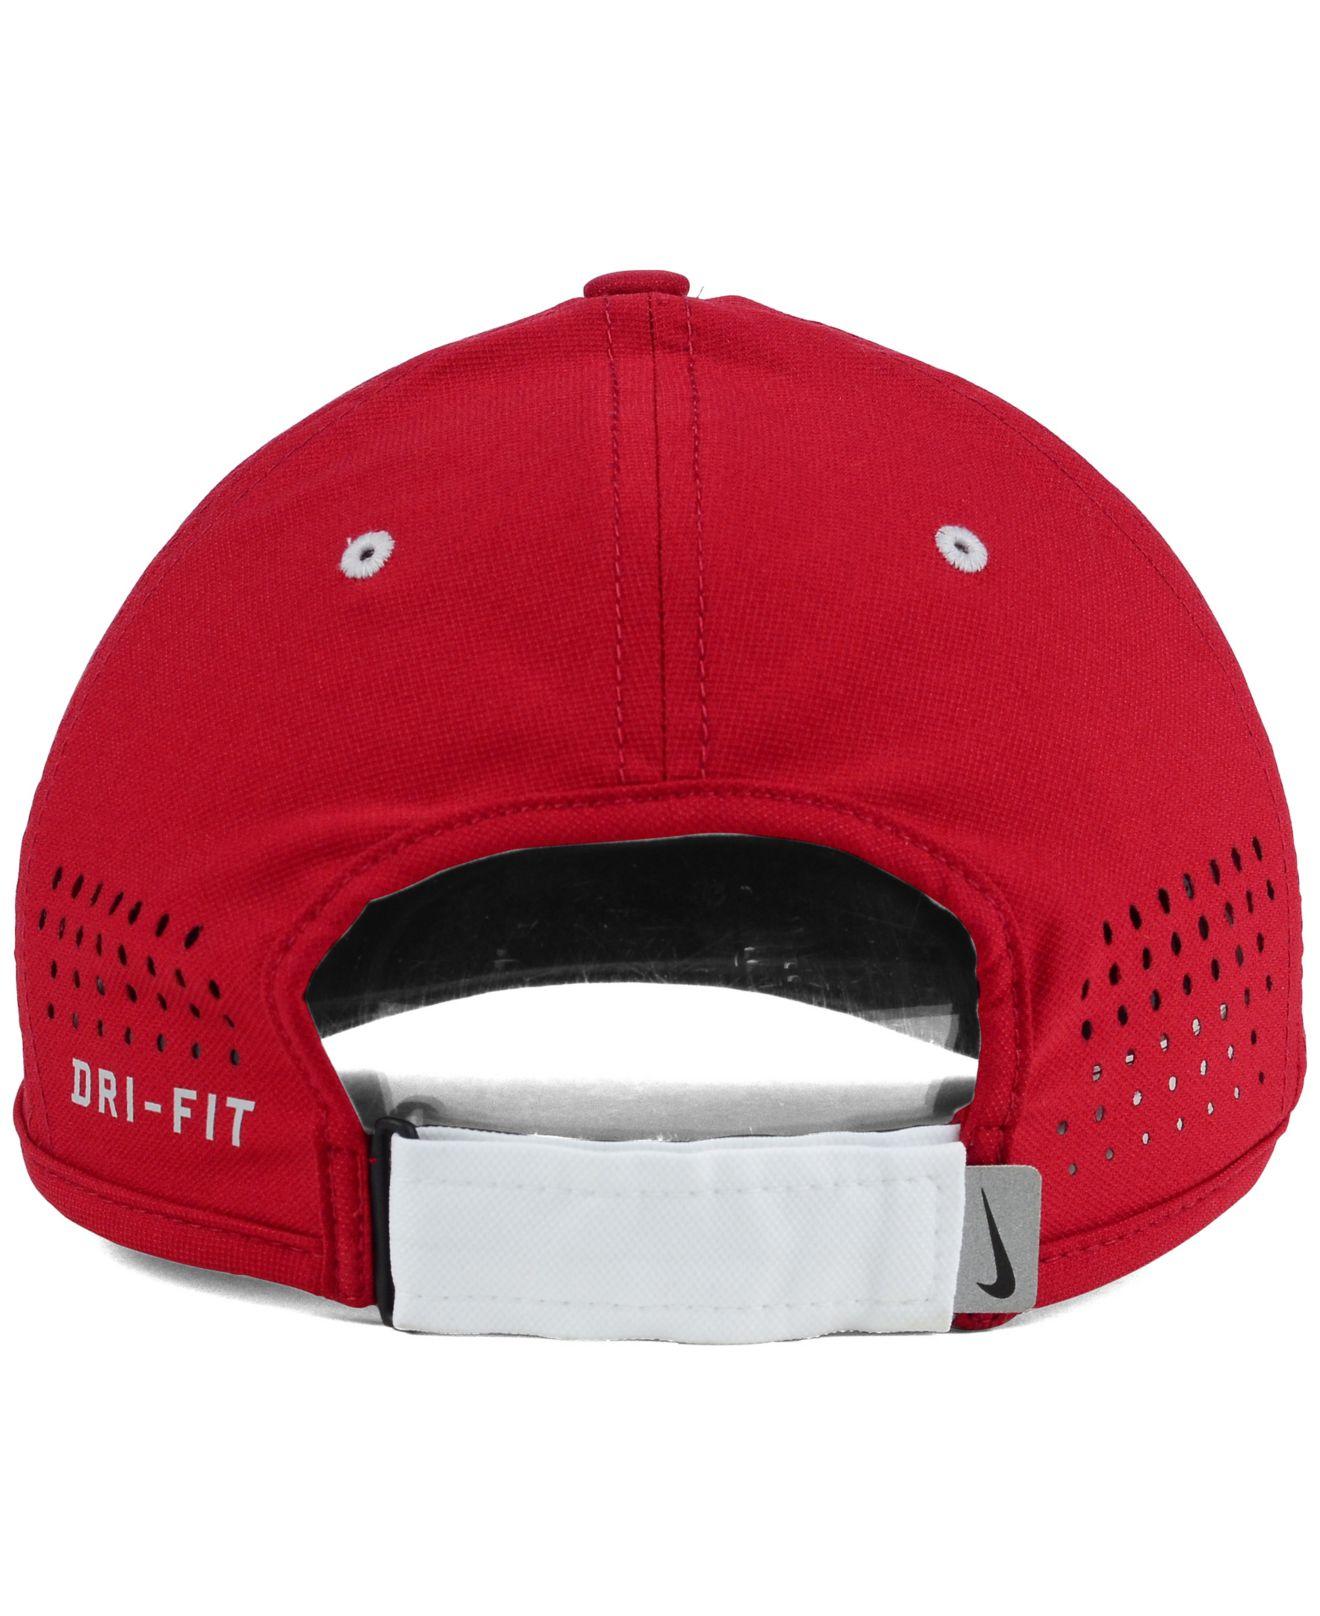 promo code f36a9 d4079 ... where to buy lyst nike alabama crimson tide coaches dri fit cap in red  for men